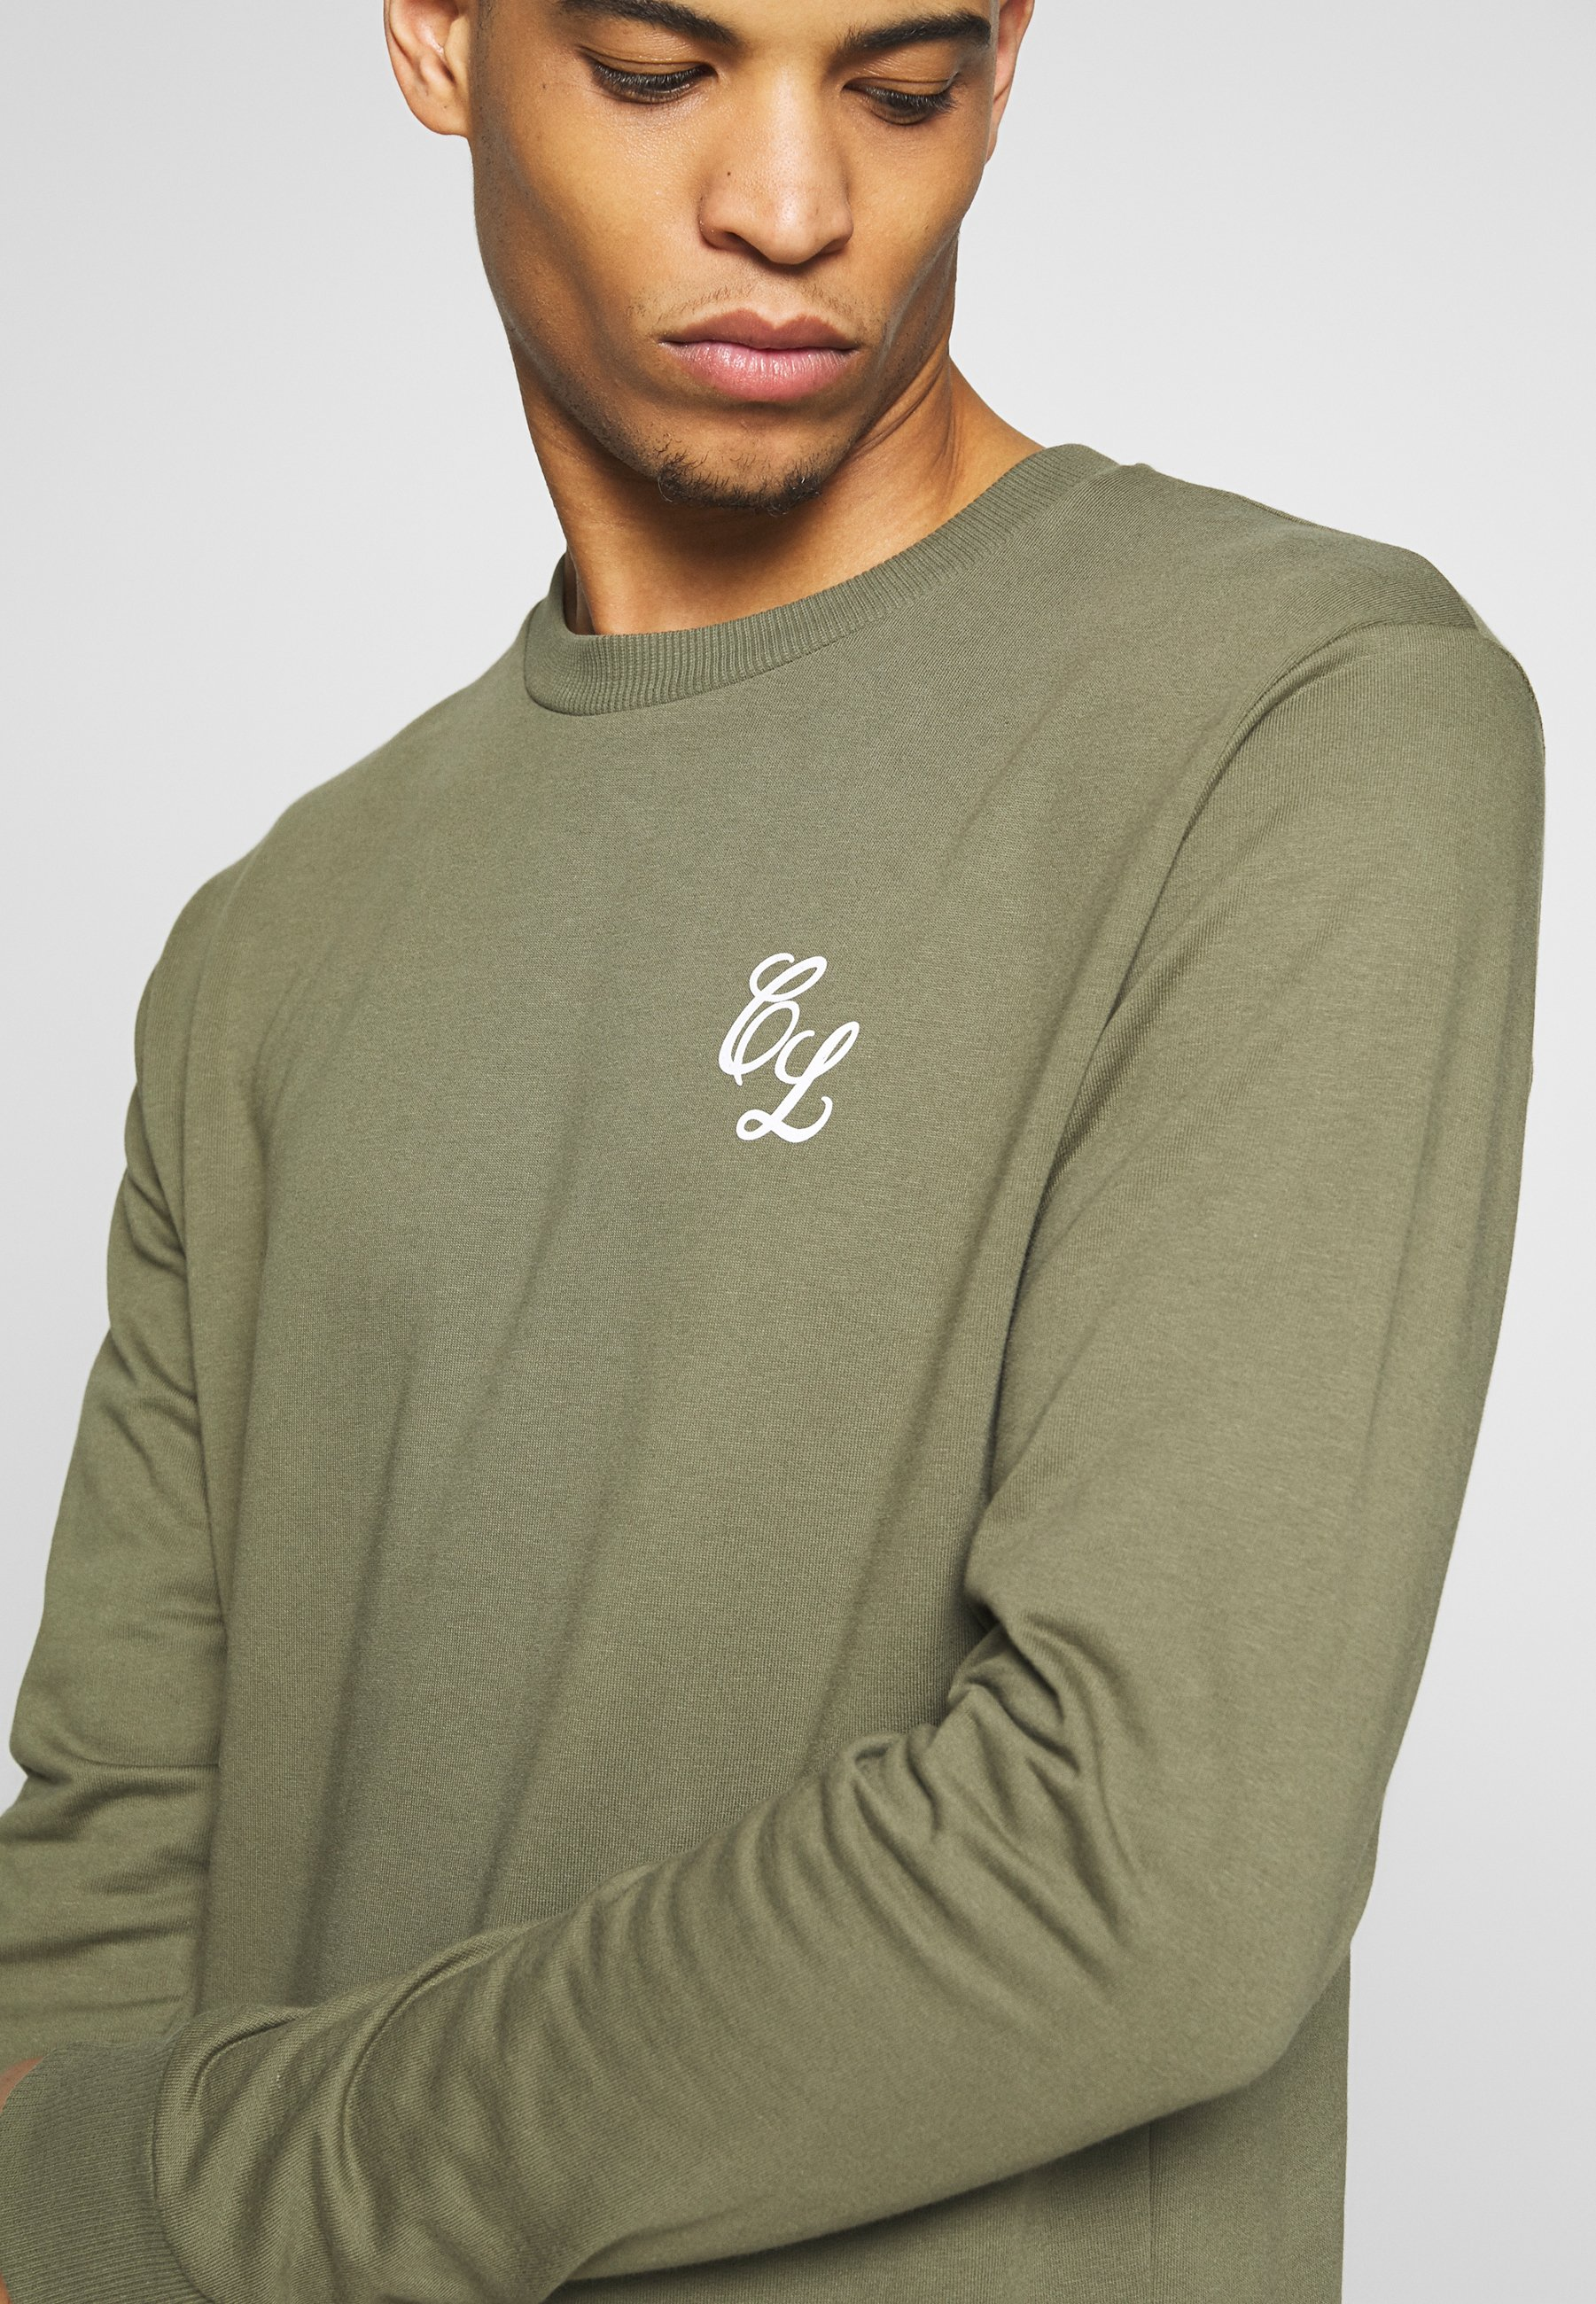 Closure London Crewneck 2 Pack - Sweatshirt Khaki/navy